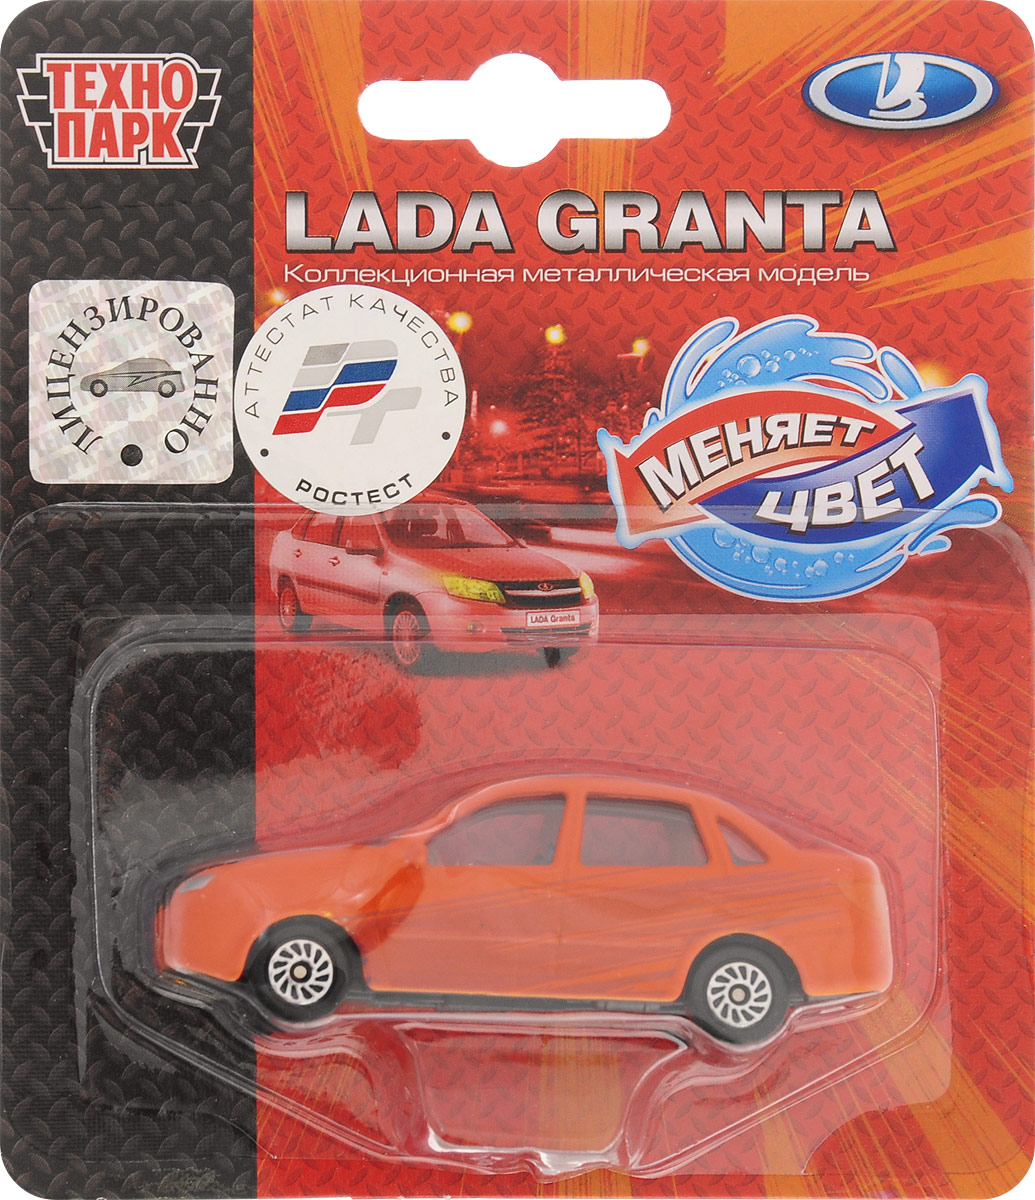 ТехноПарк Автомобиль Lada Granta технопарк автомобиль lada granta